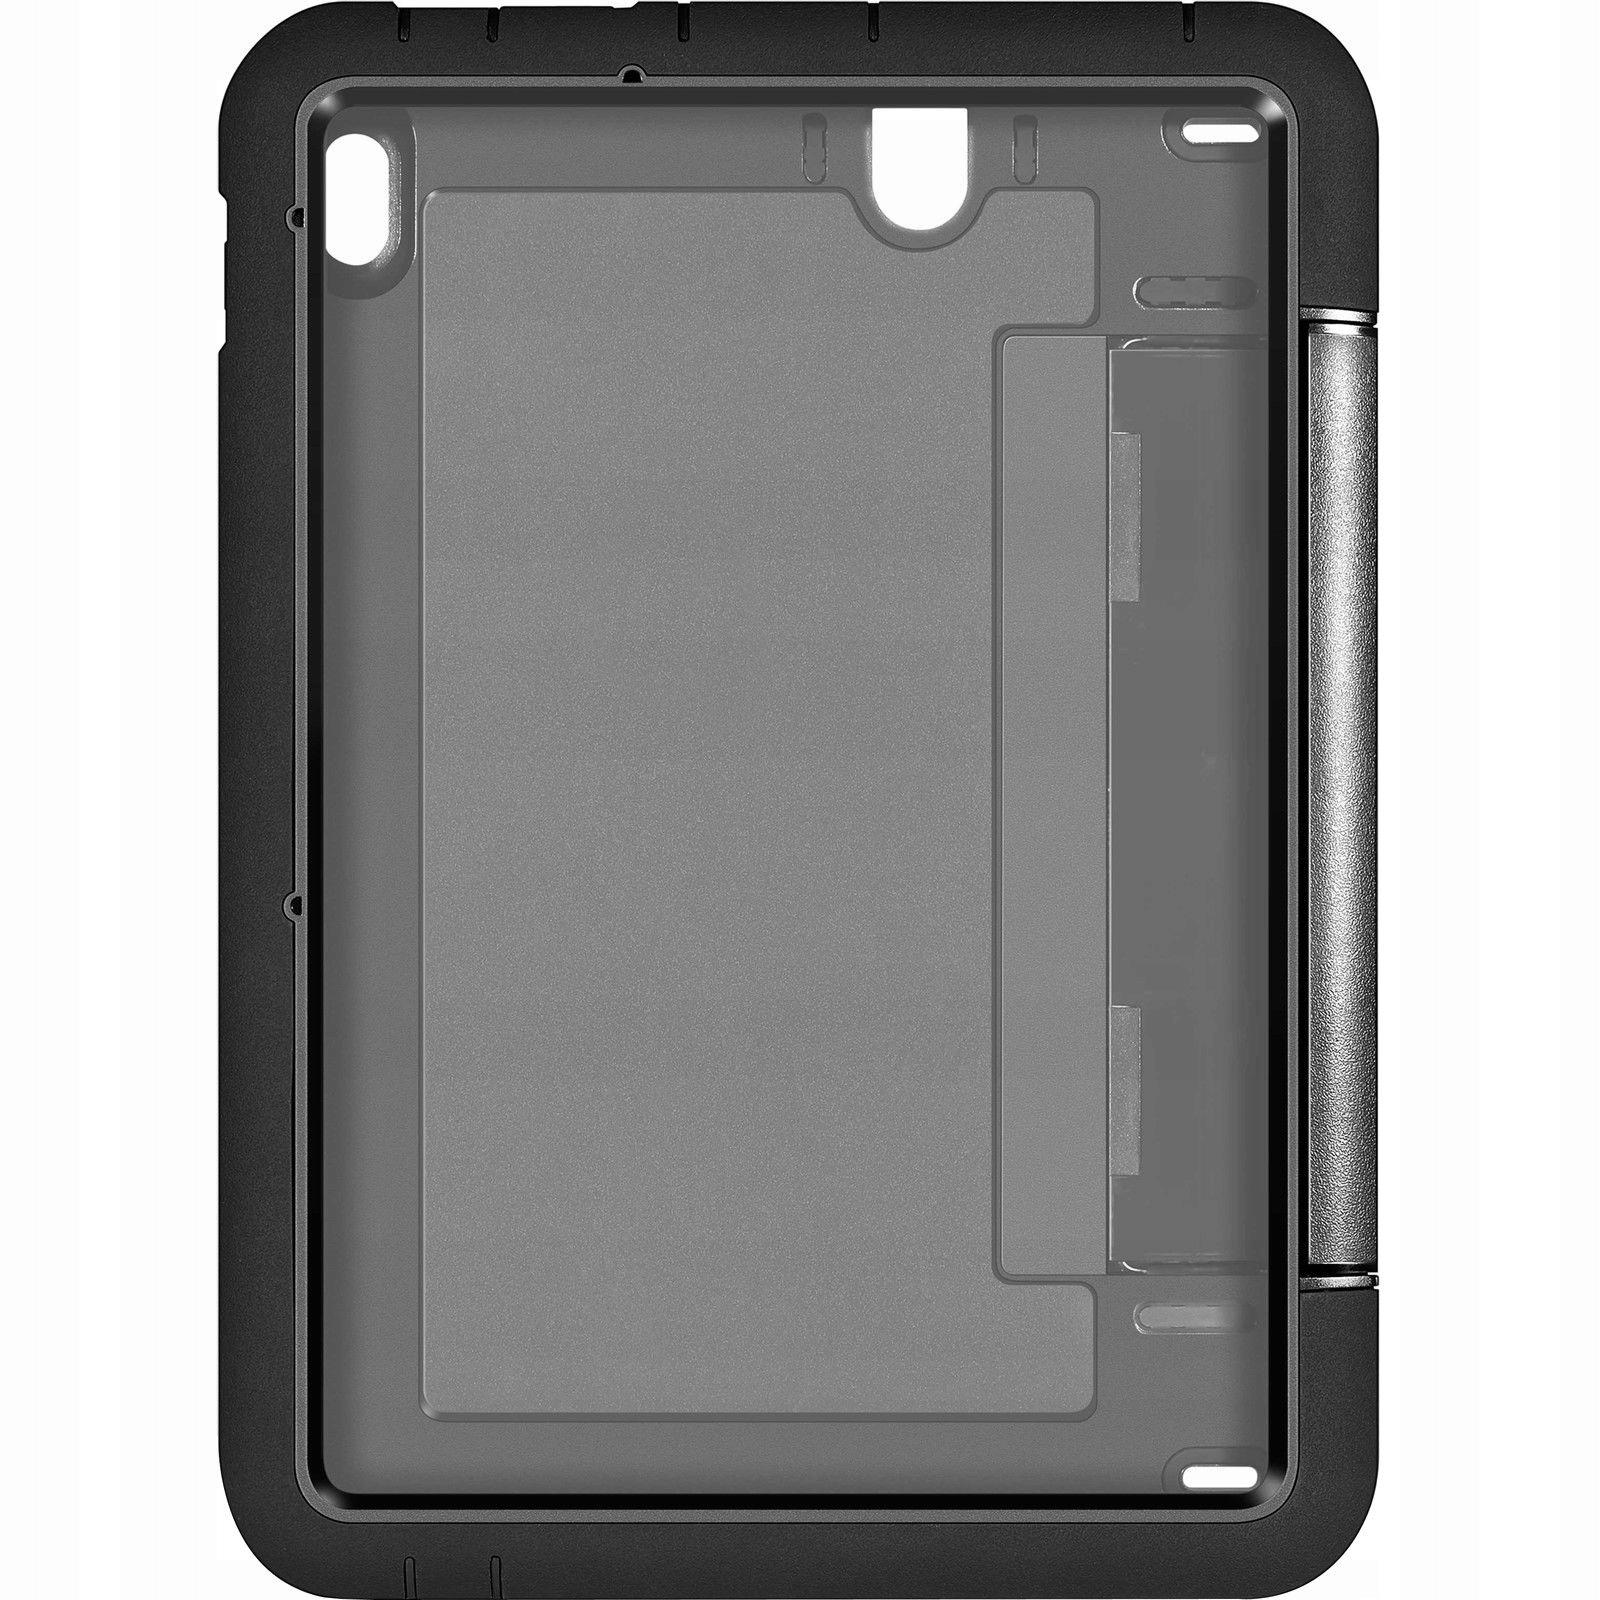 Lenovo ThinkPad 10 Protector Gen 2 (4X40H01536)